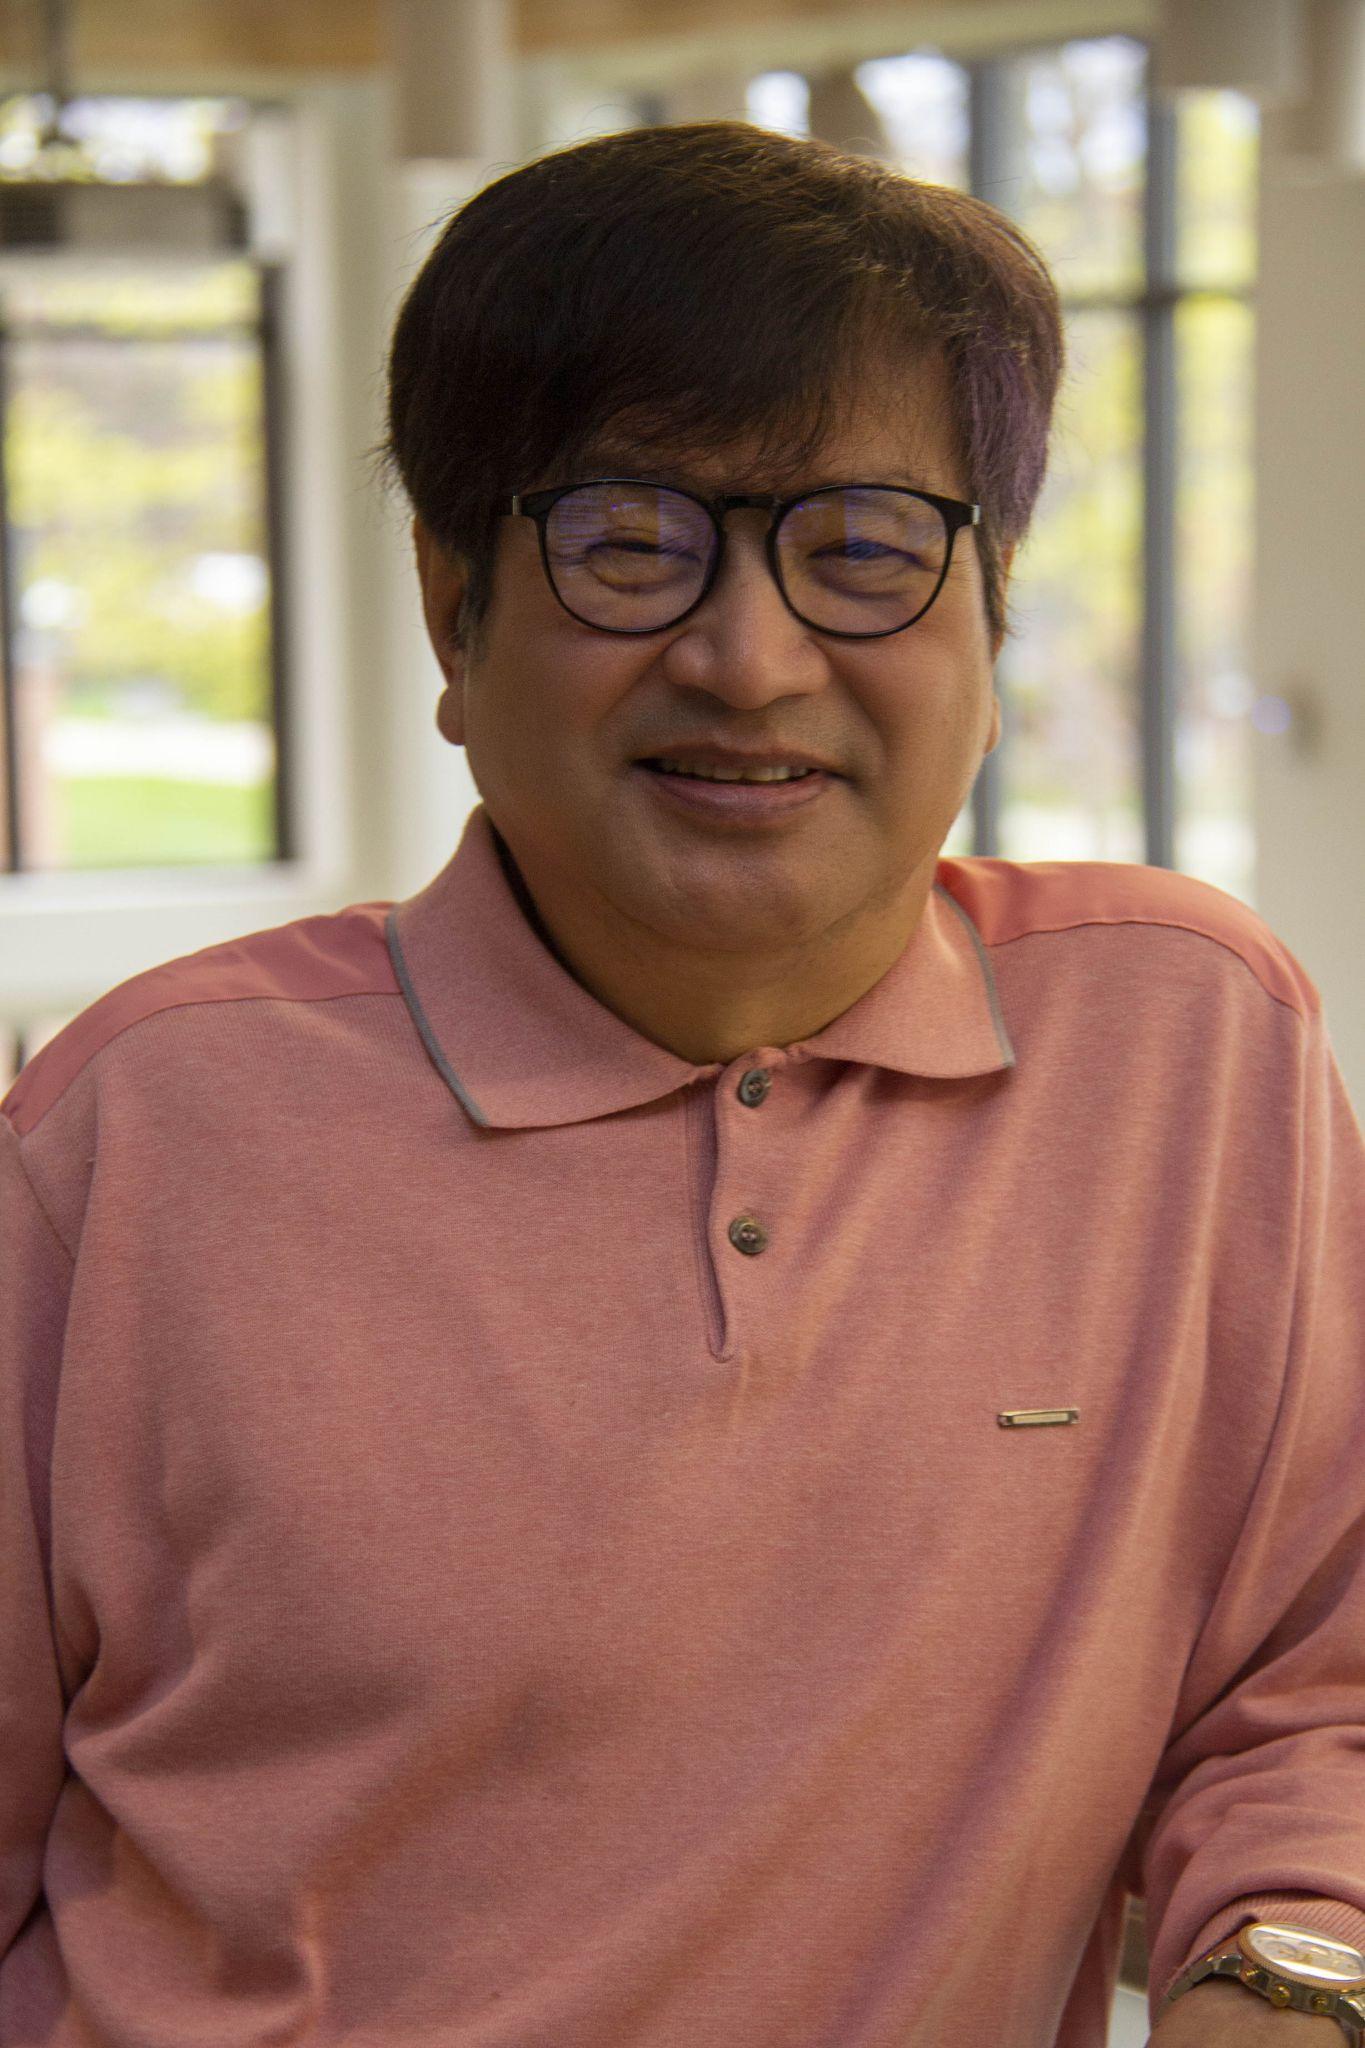 www.ourmidland.com: Asian CMU professor: If I do not belong here, where should I belong?